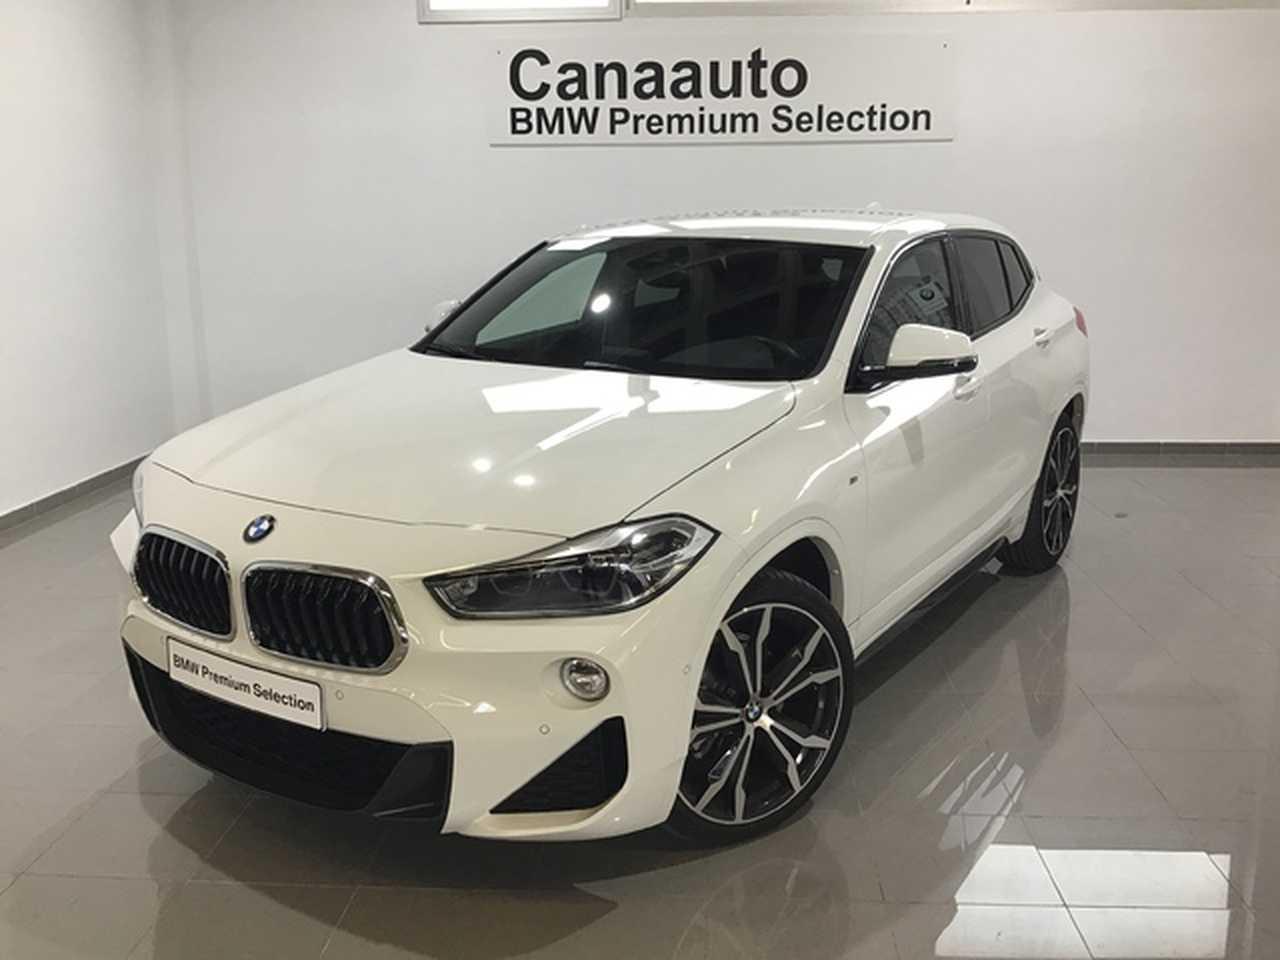 BMW X2 sDrive18i 103 kW (140 CV)  - Foto 1